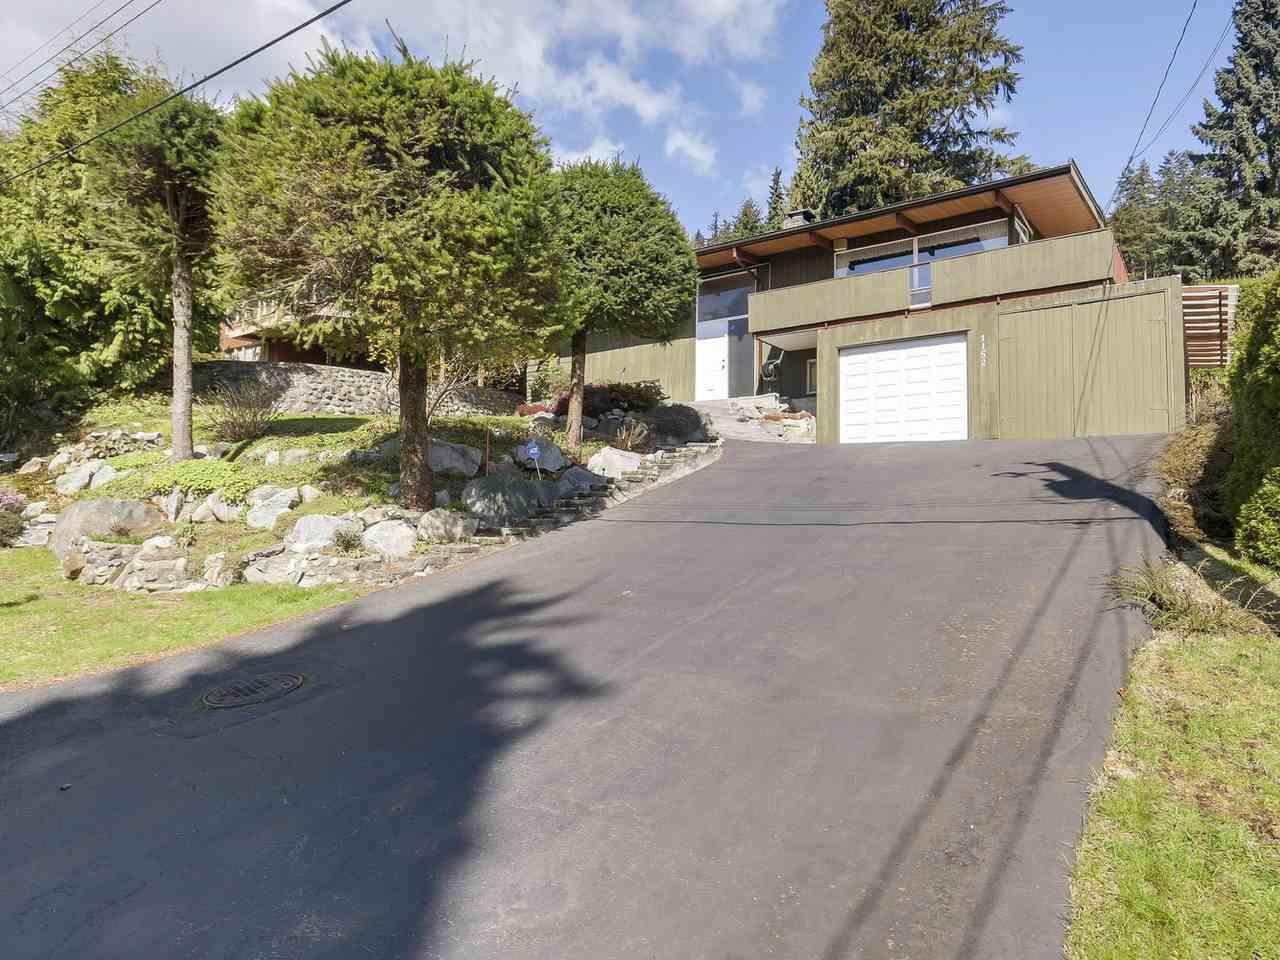 1152 CHAMBERLAIN DRIVE, North Vancouver - R2155459